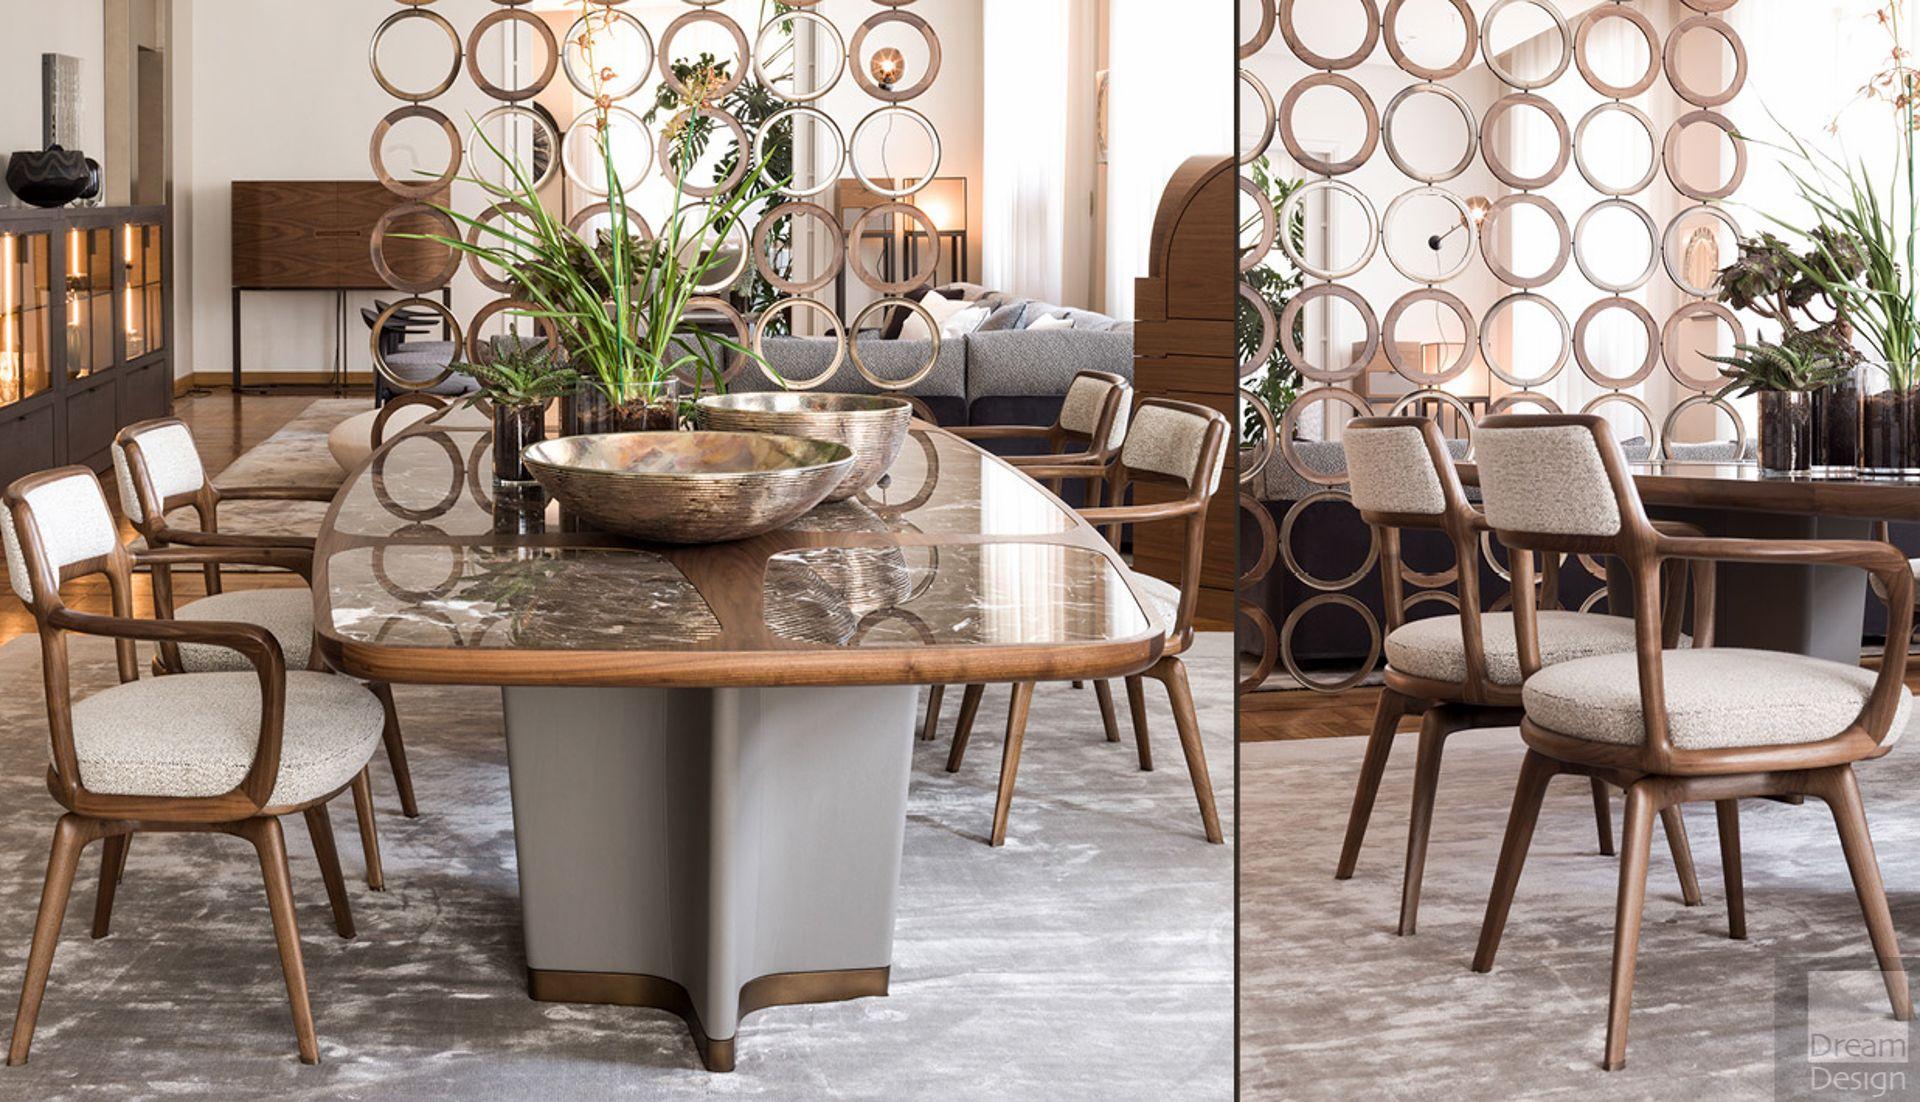 Bigwig Table Table, Luxury interior, Dining table